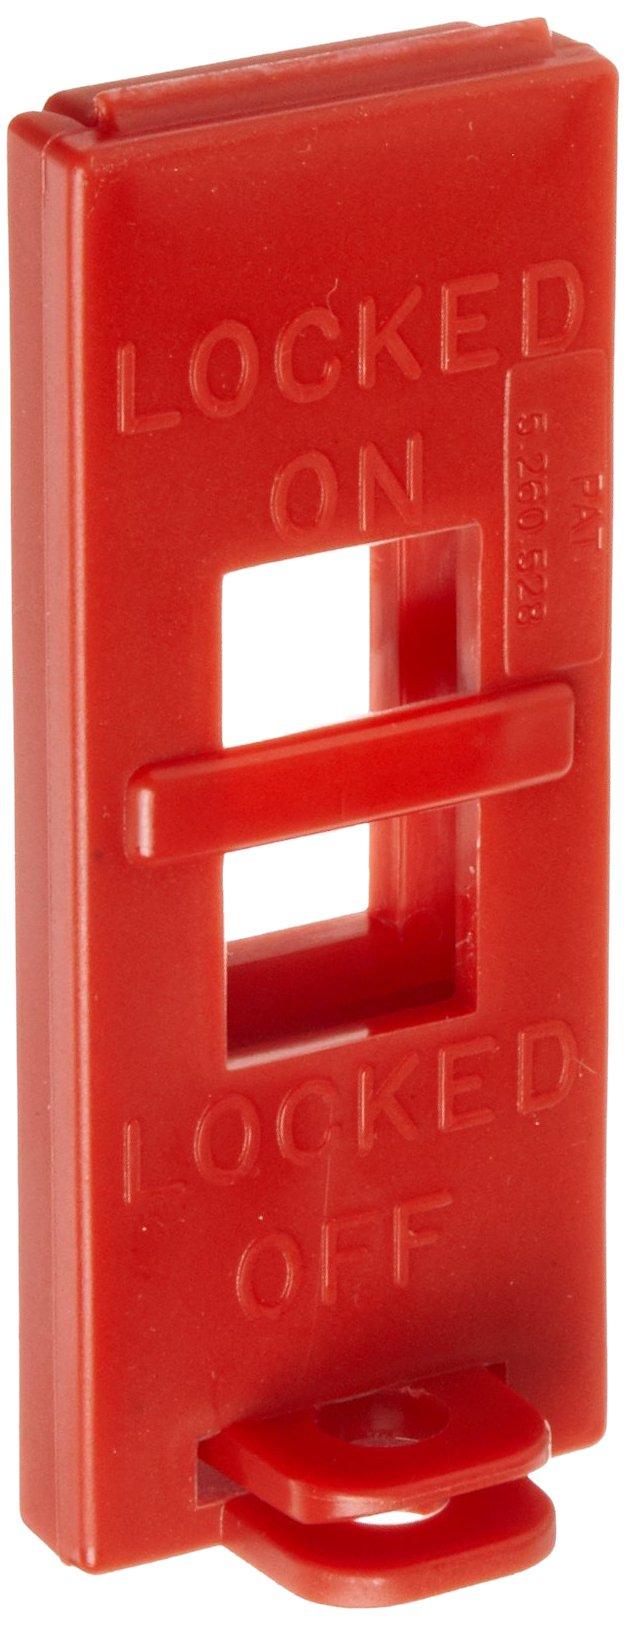 Brady Wall Switch Lockout (Pack of 1)